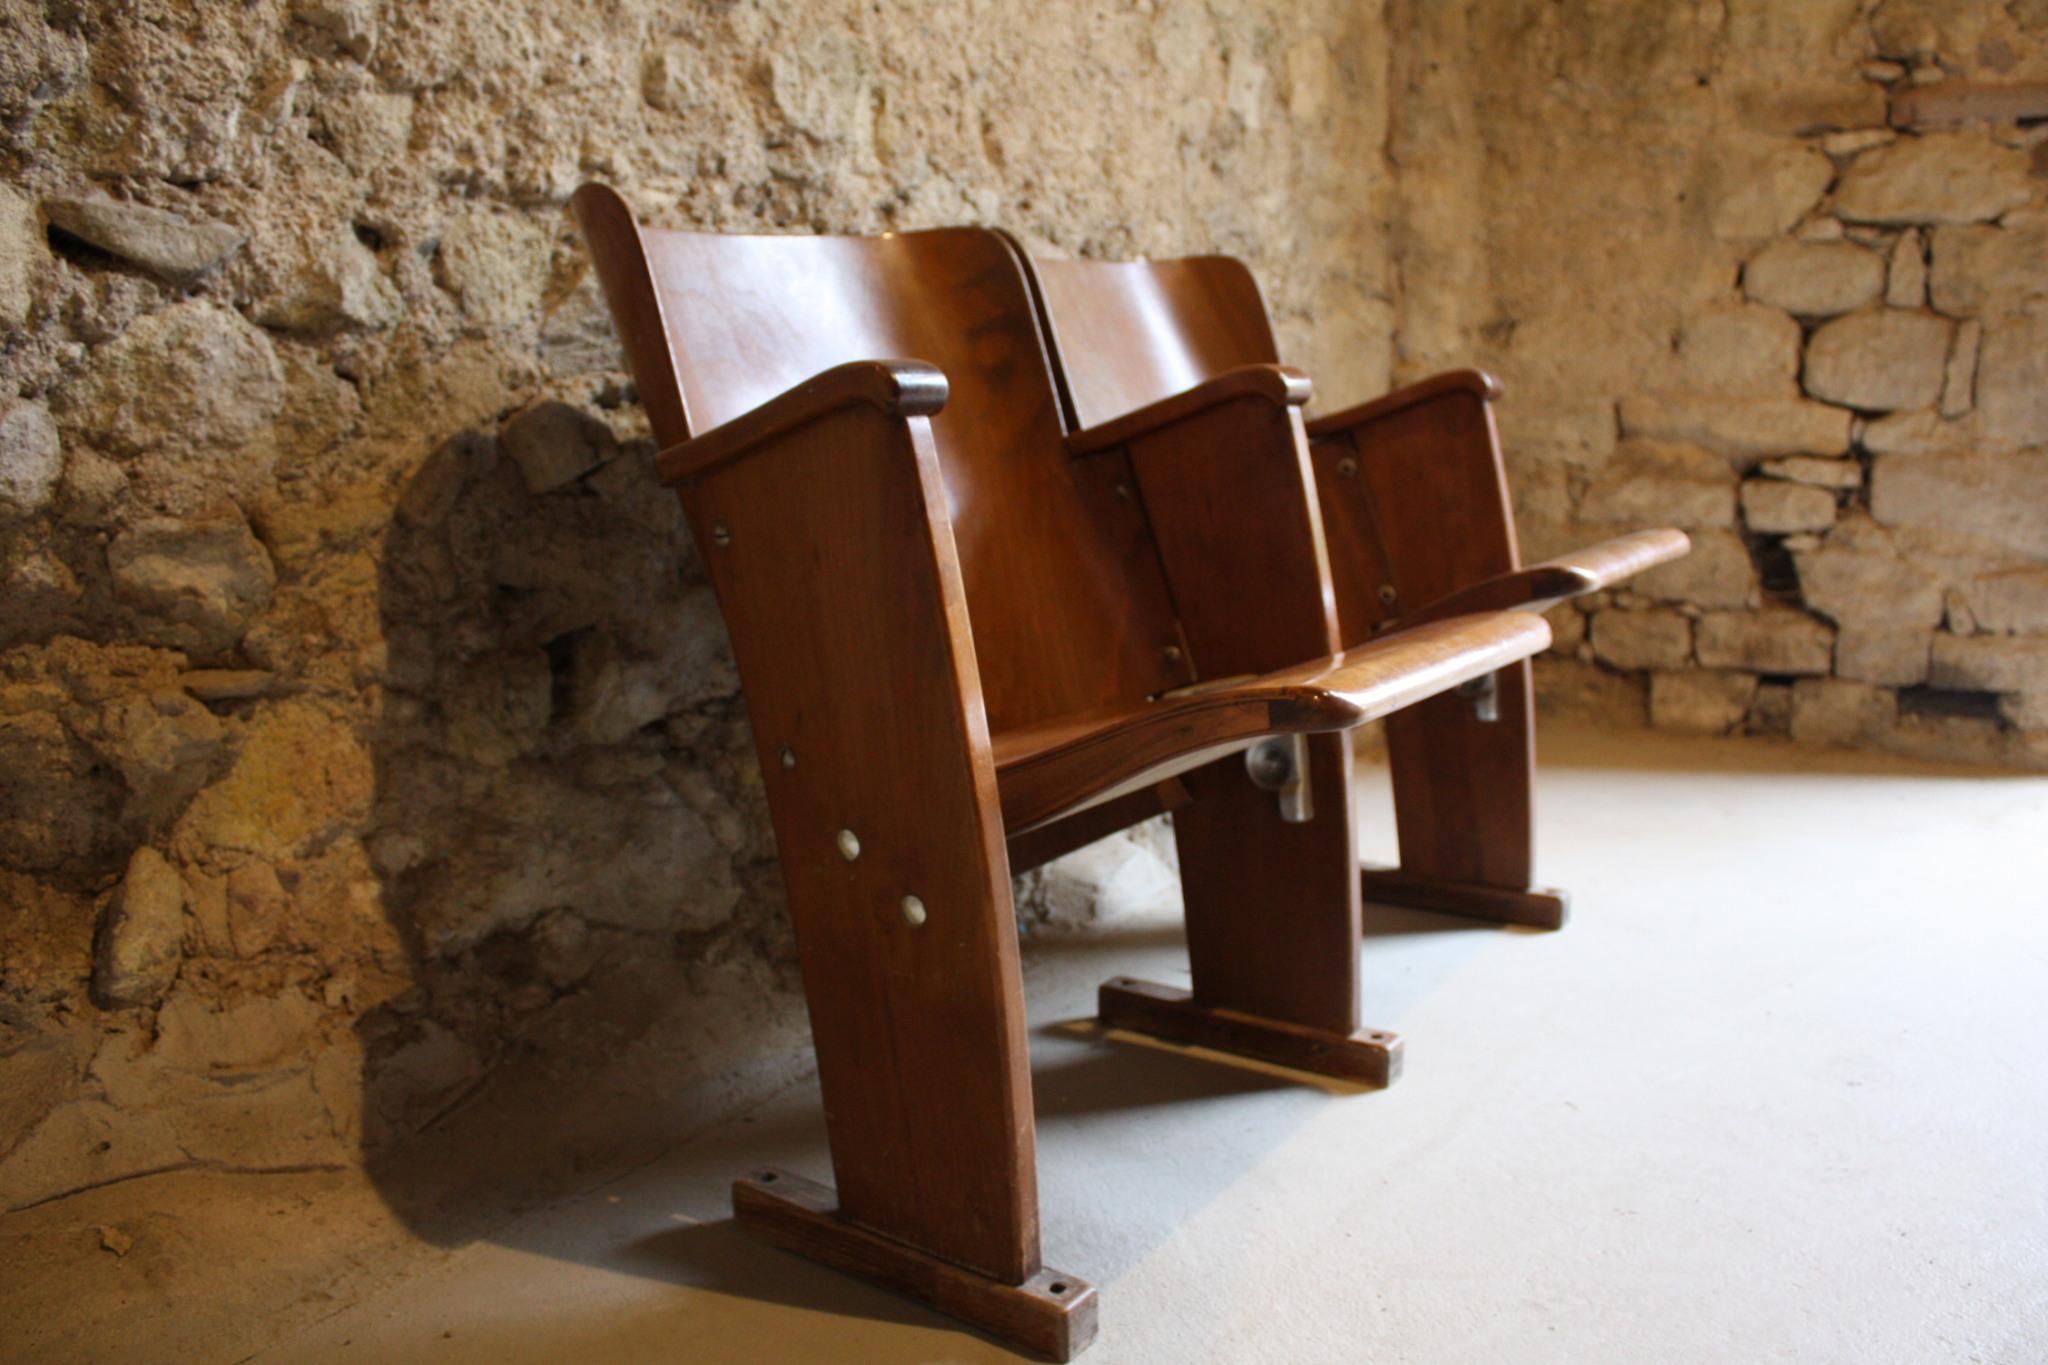 antike-kinostuhle-horsaalstuhle-gebraucht-vintage-alt-bauhaus-modern-loft-6